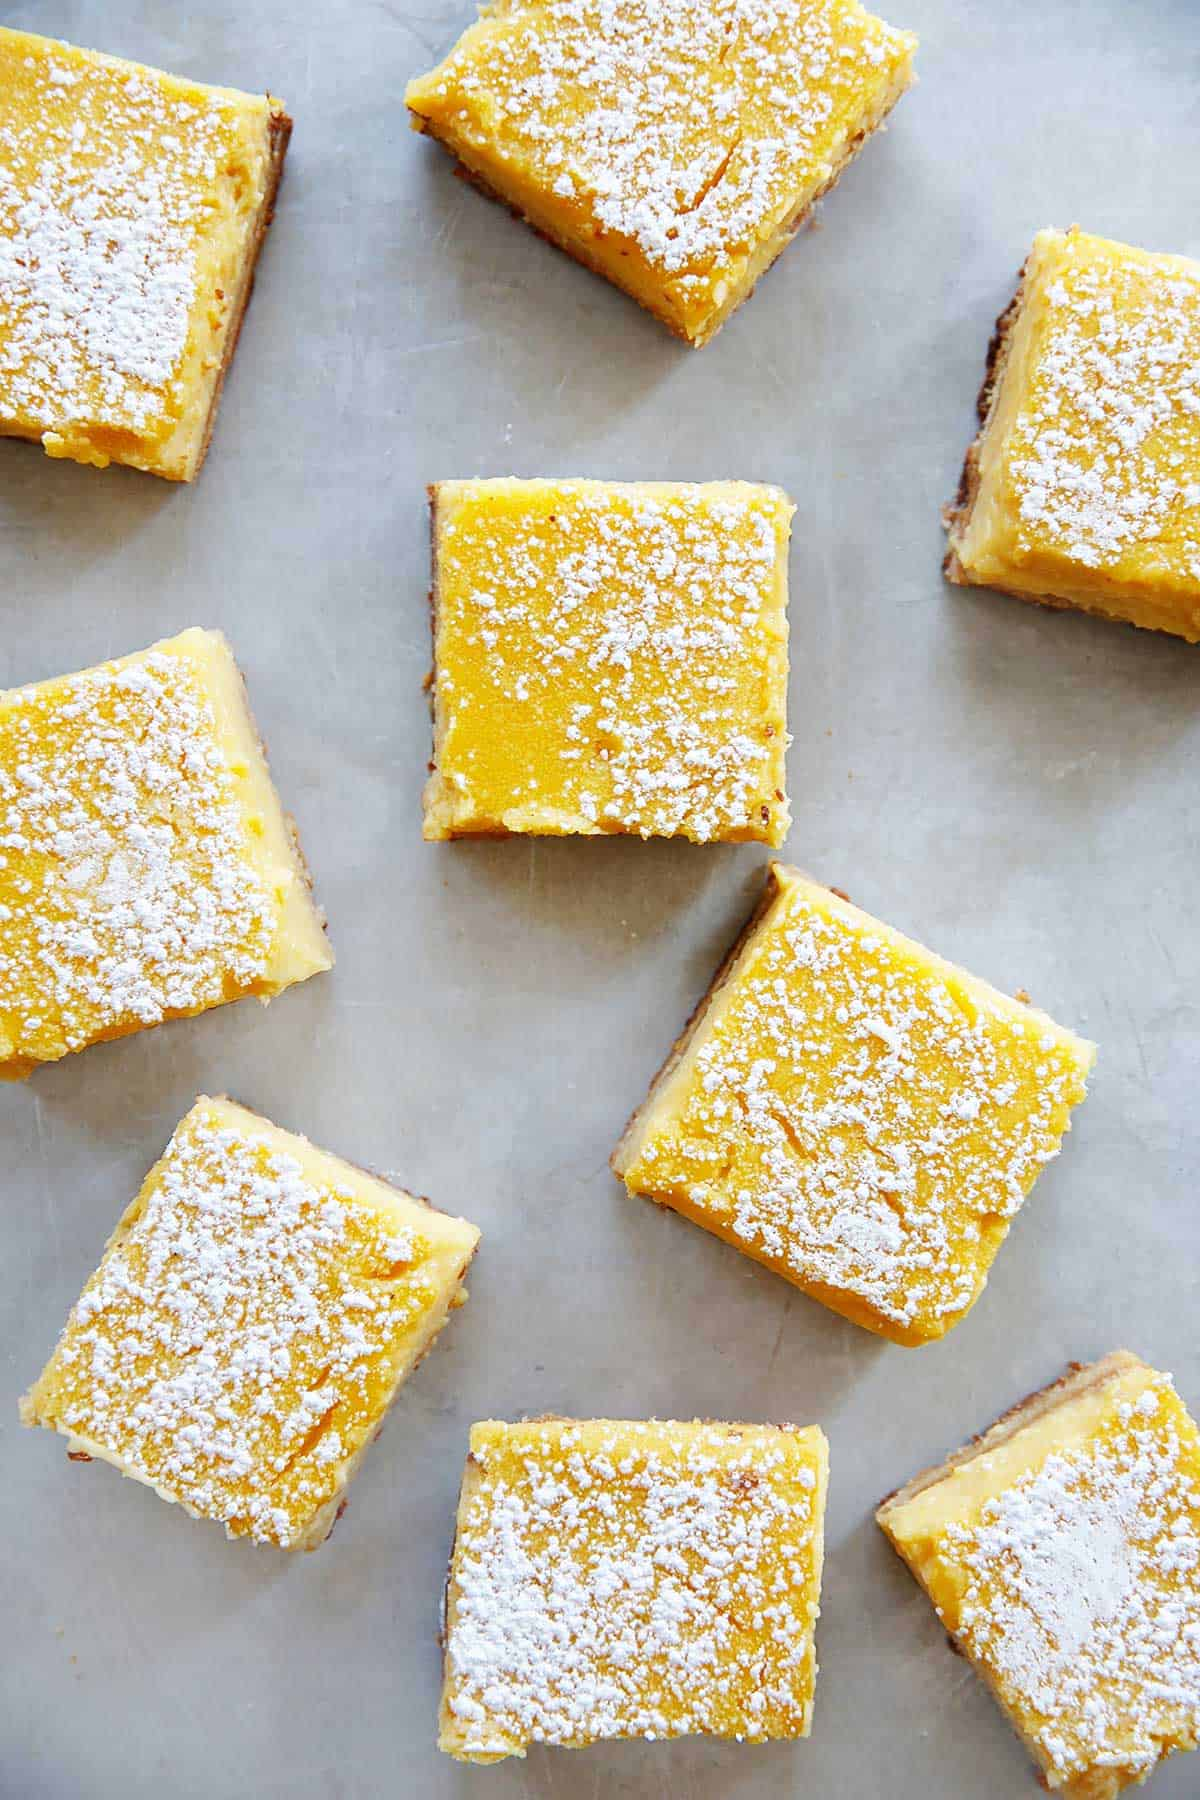 Gluten free lemon bars almond flour with powdered sugar